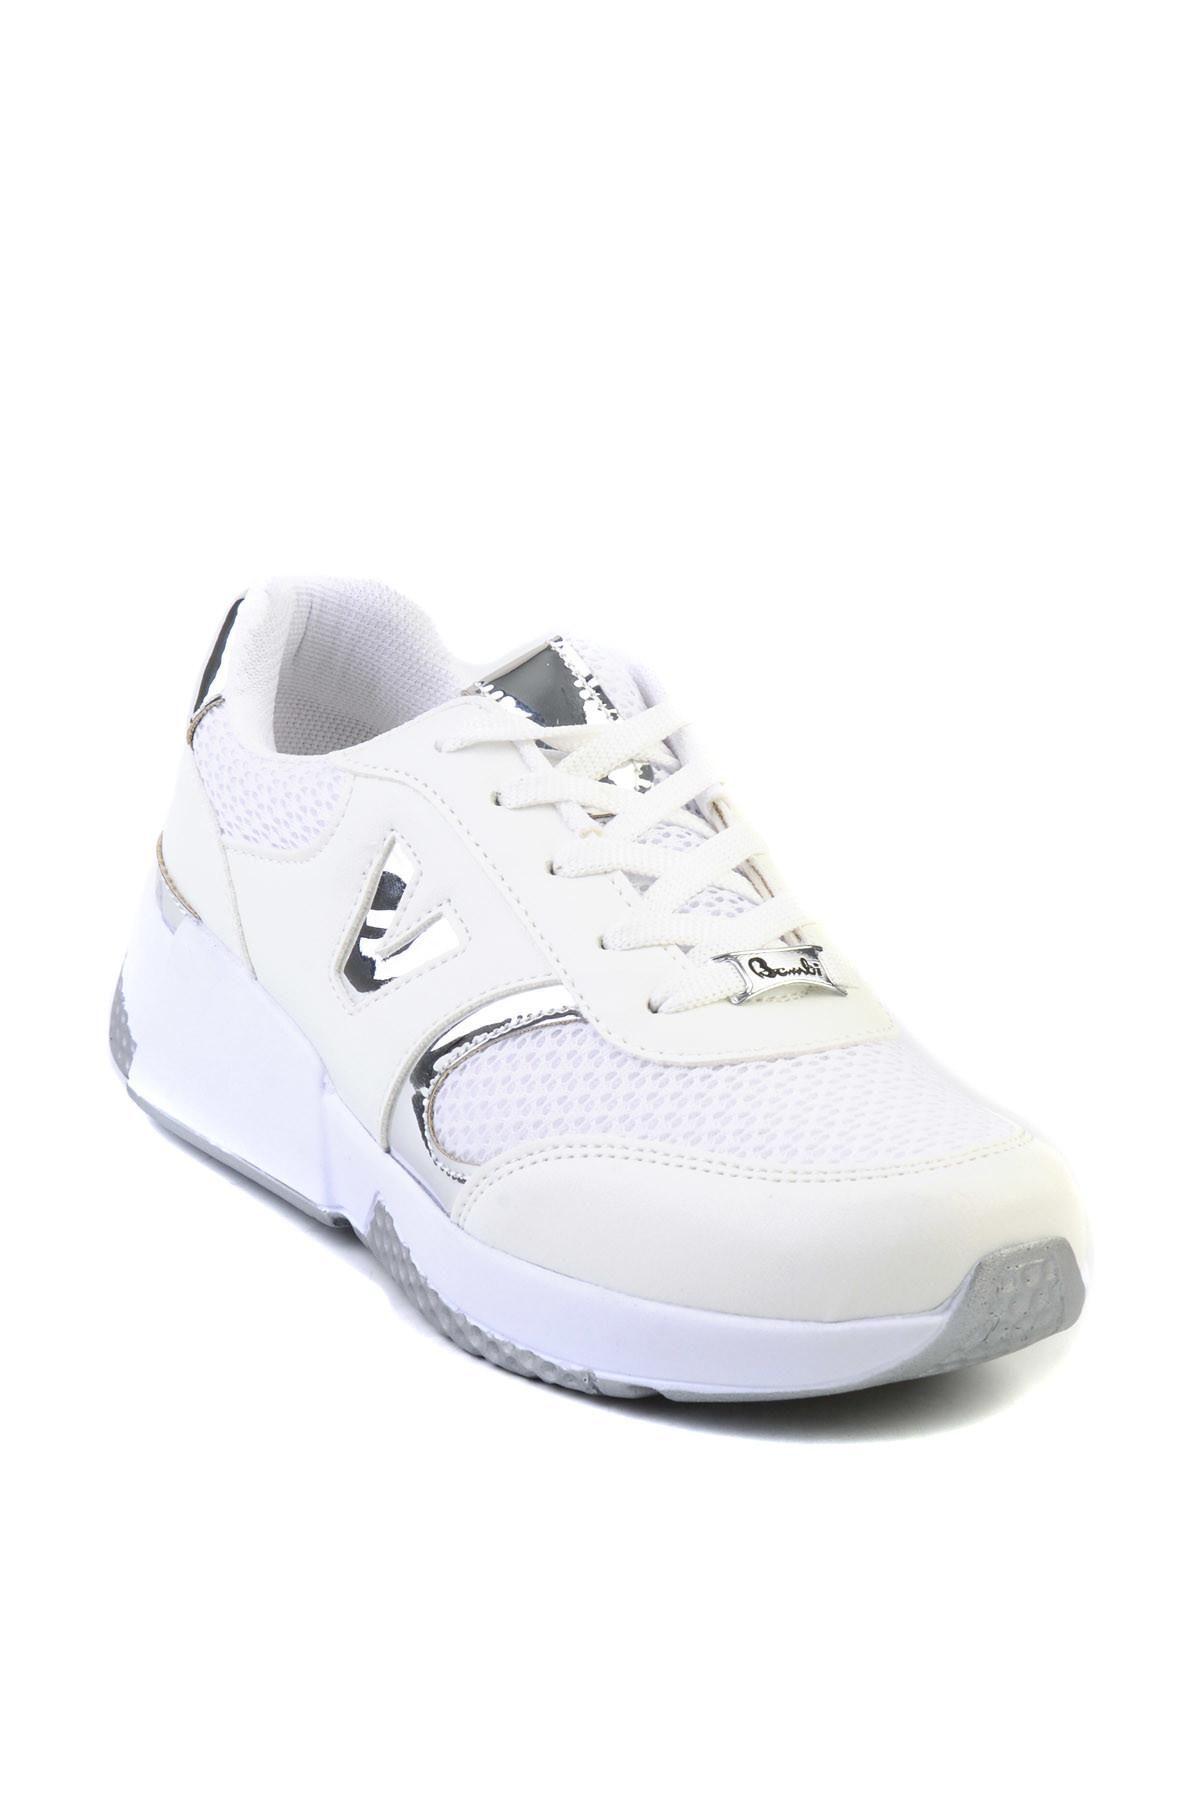 Bambi White Women 'S Sneaker H0598030299